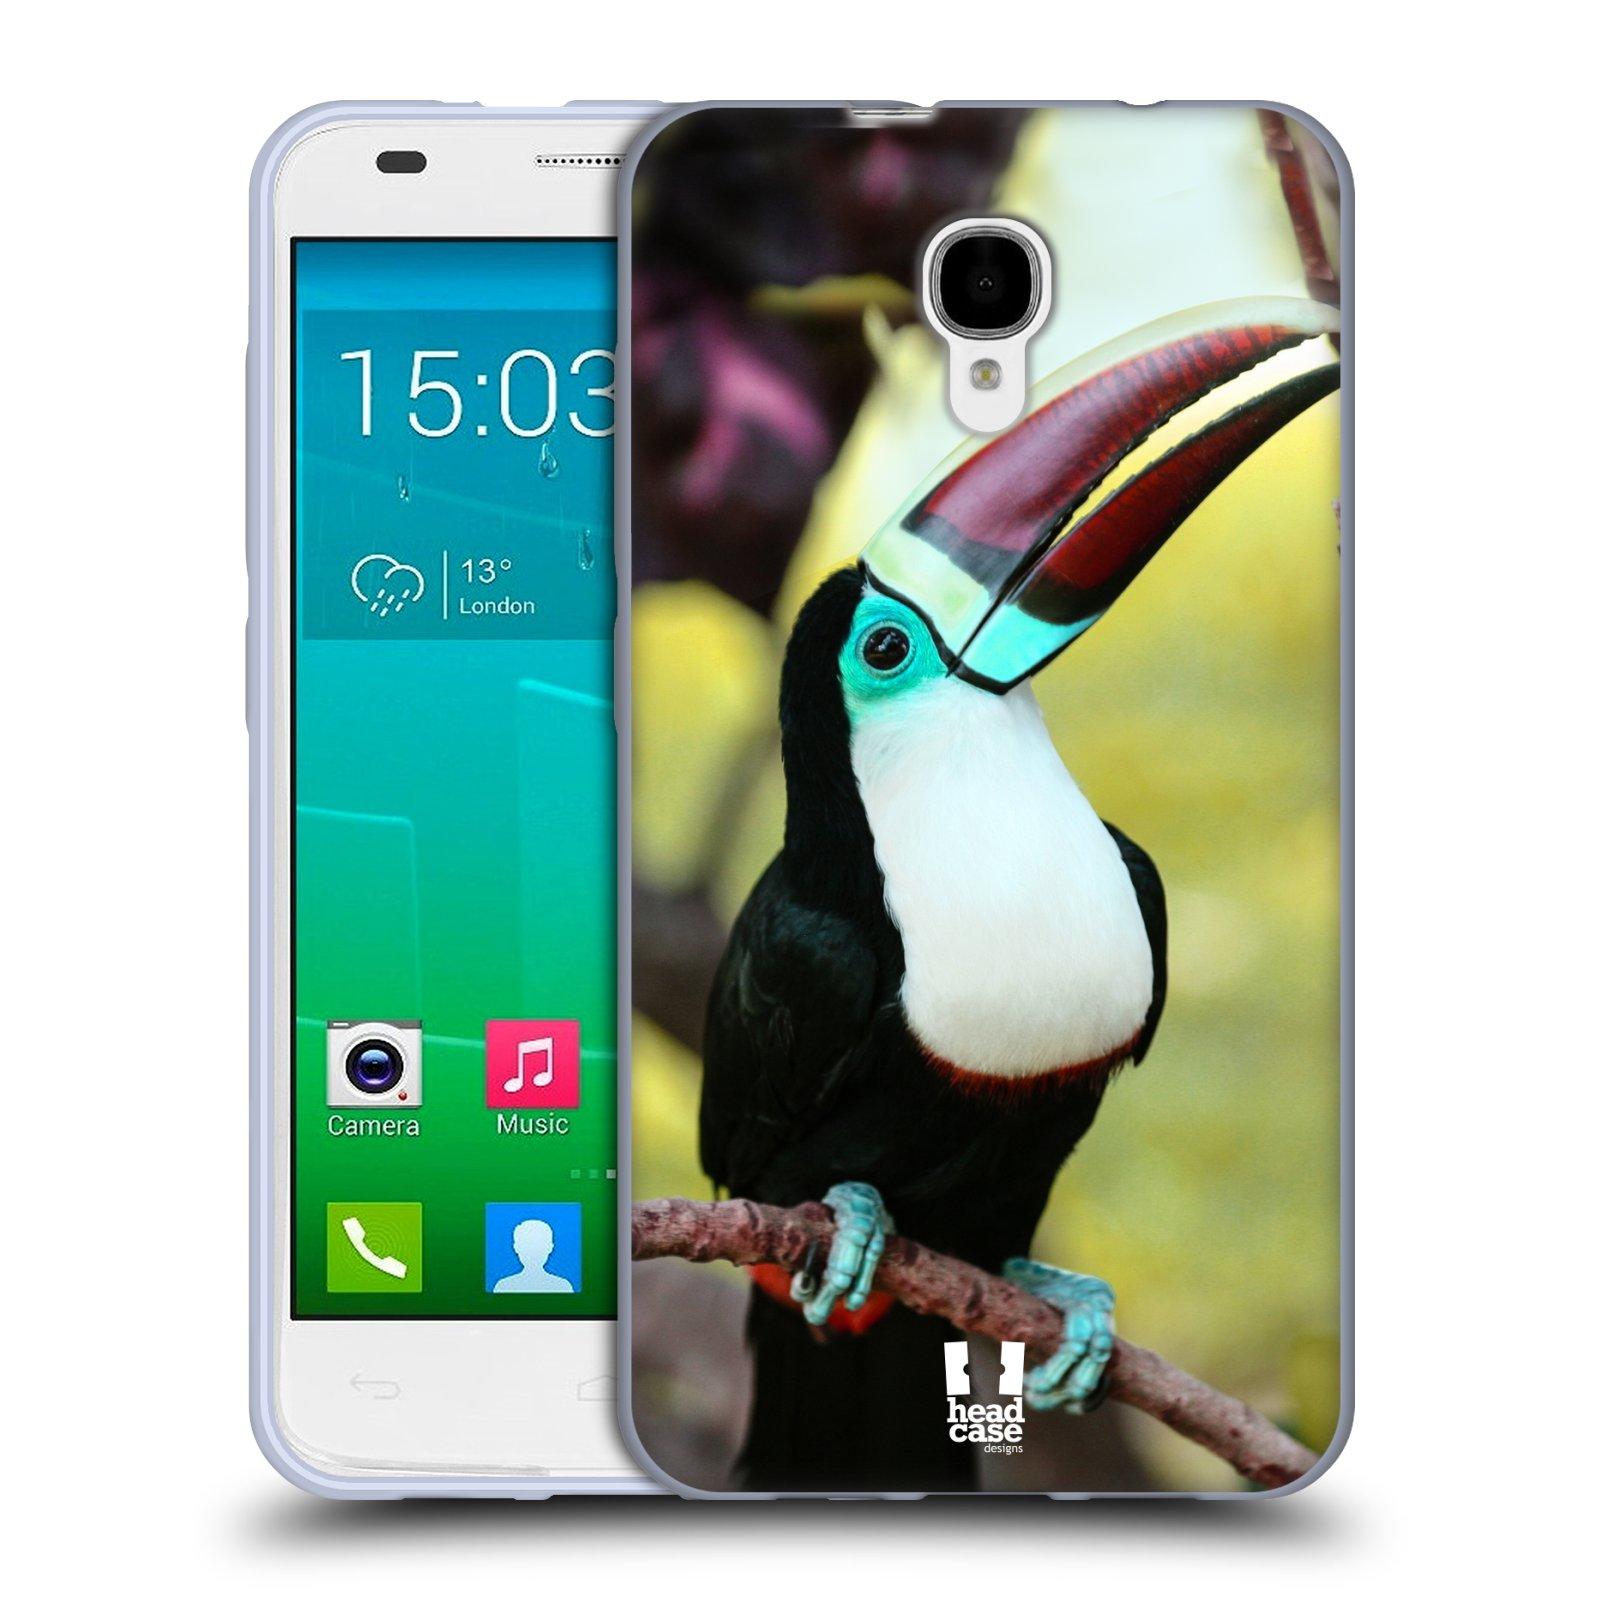 HEAD CASE silikonový obal na mobil Alcatel Idol 2 S OT-6050 vzor slavná zvířata foto tukan